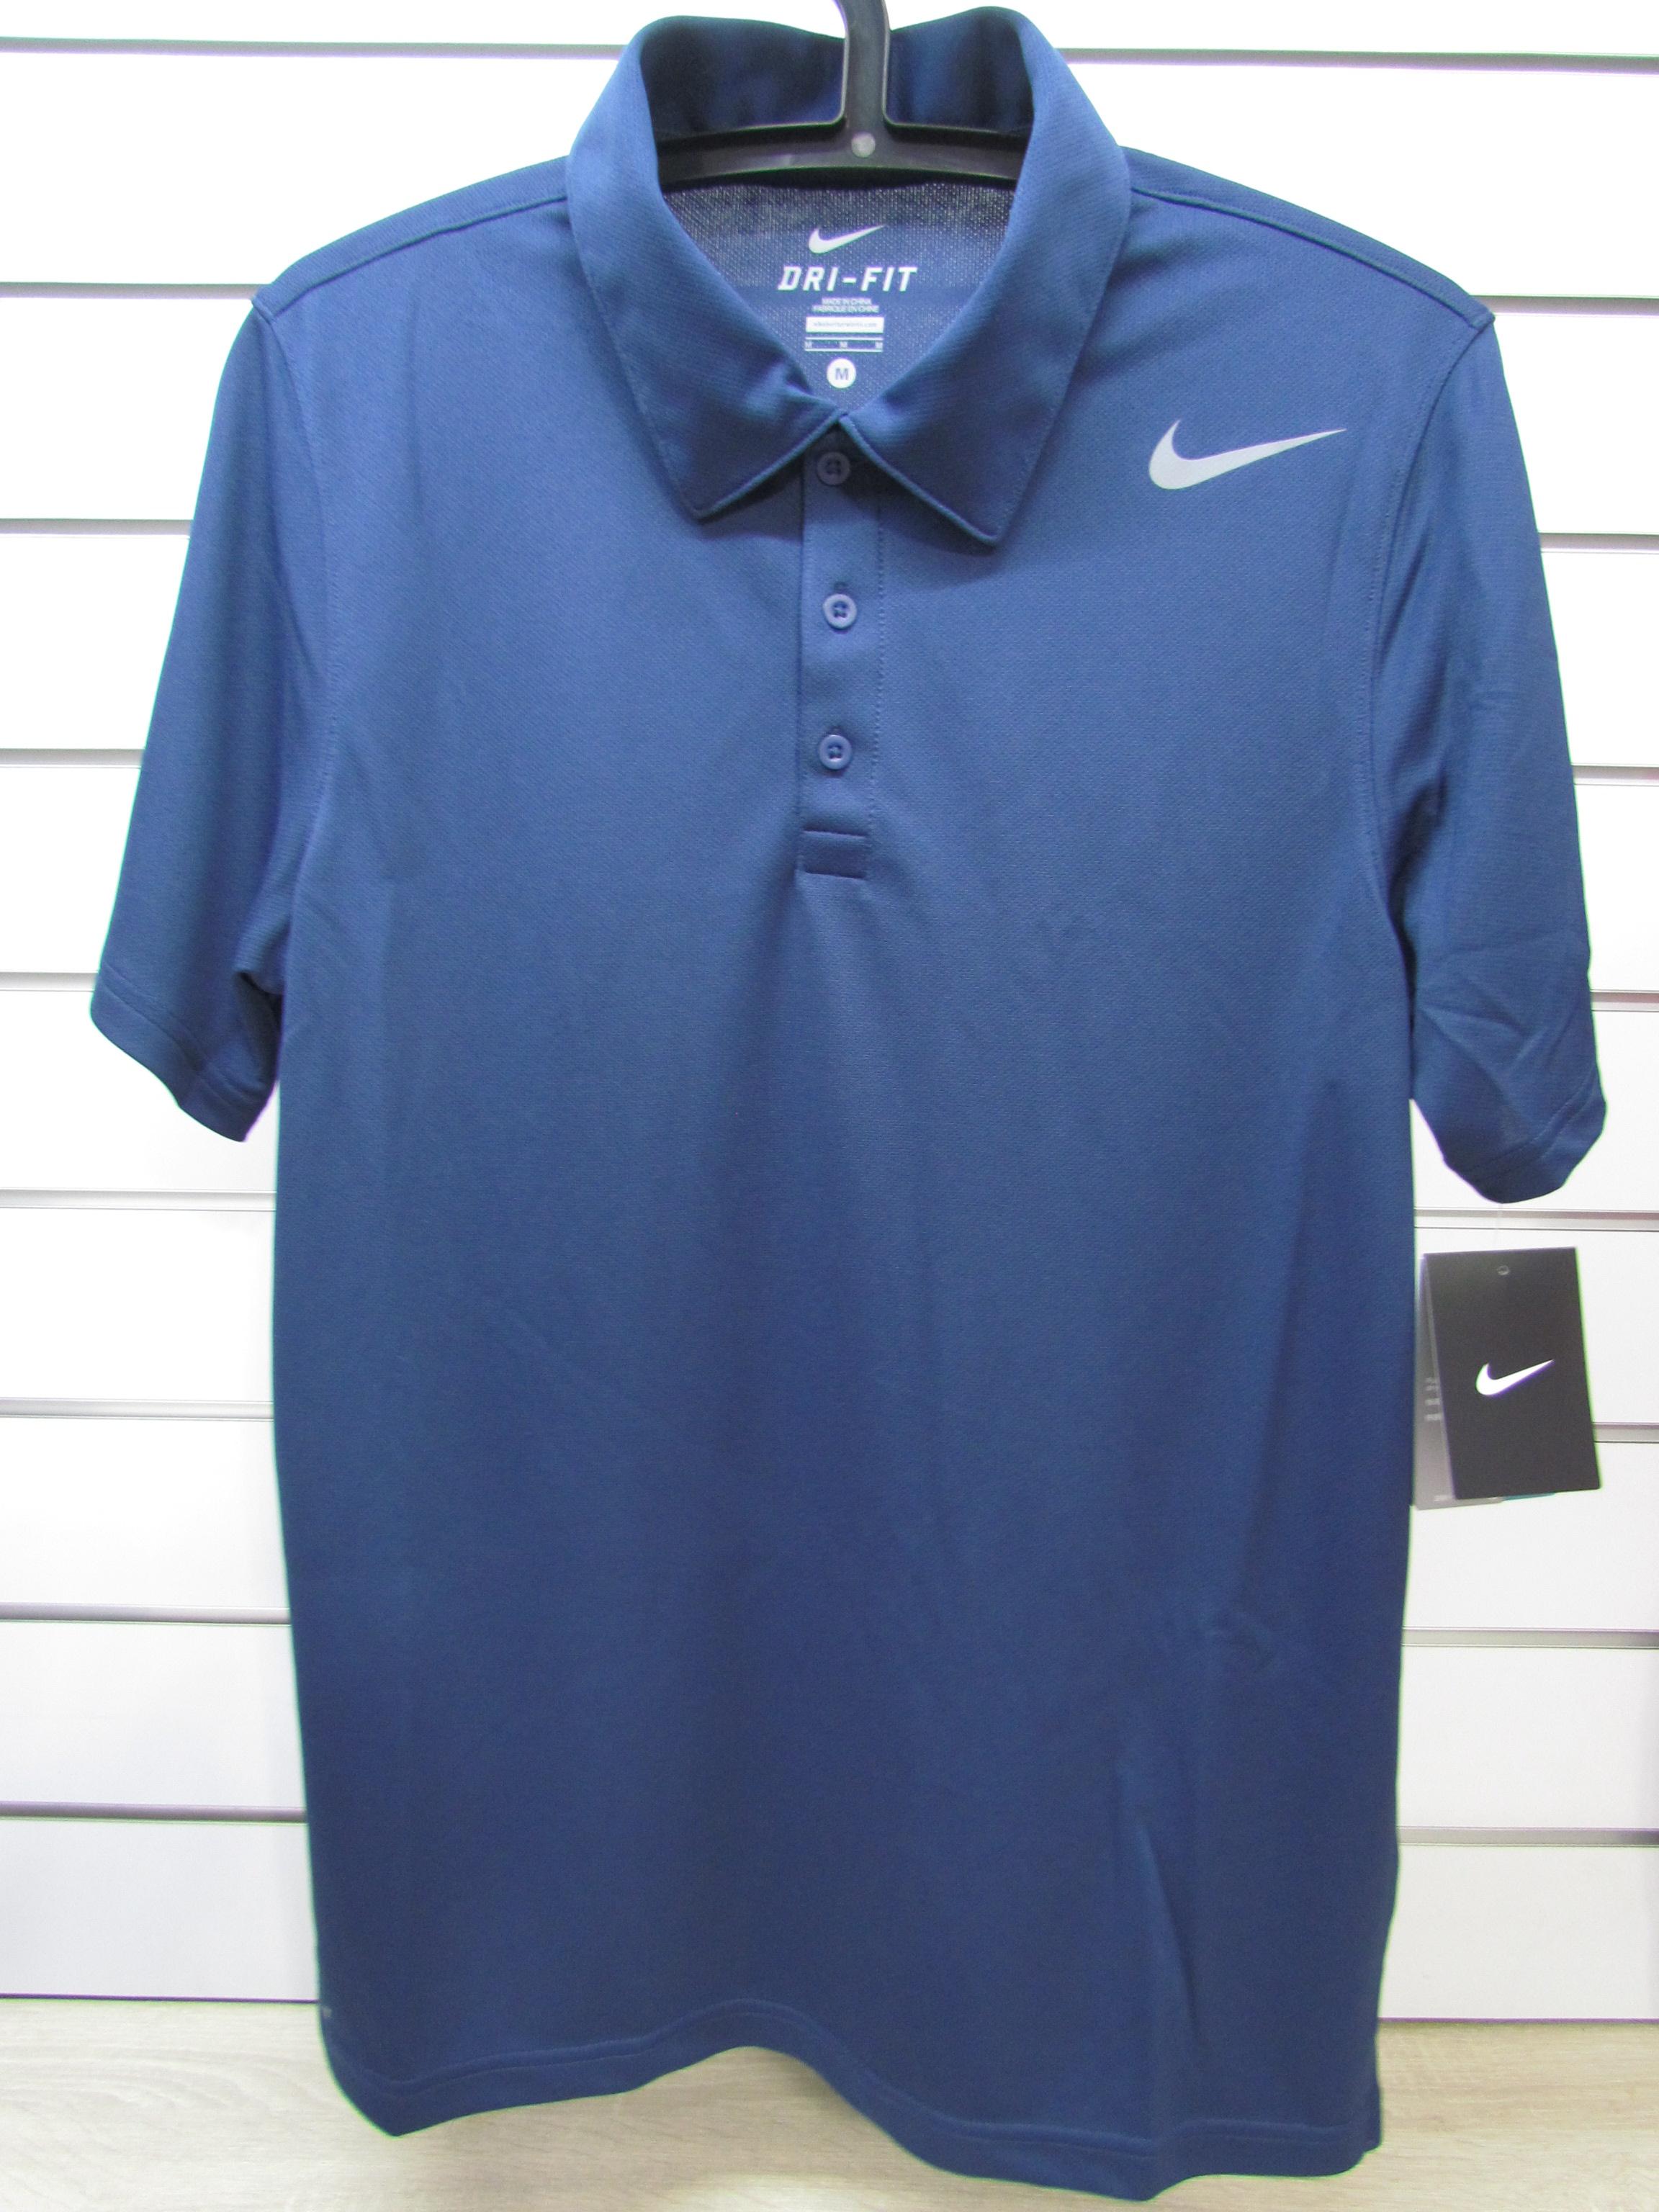 Nike Dri-Fit Classic Polo衫